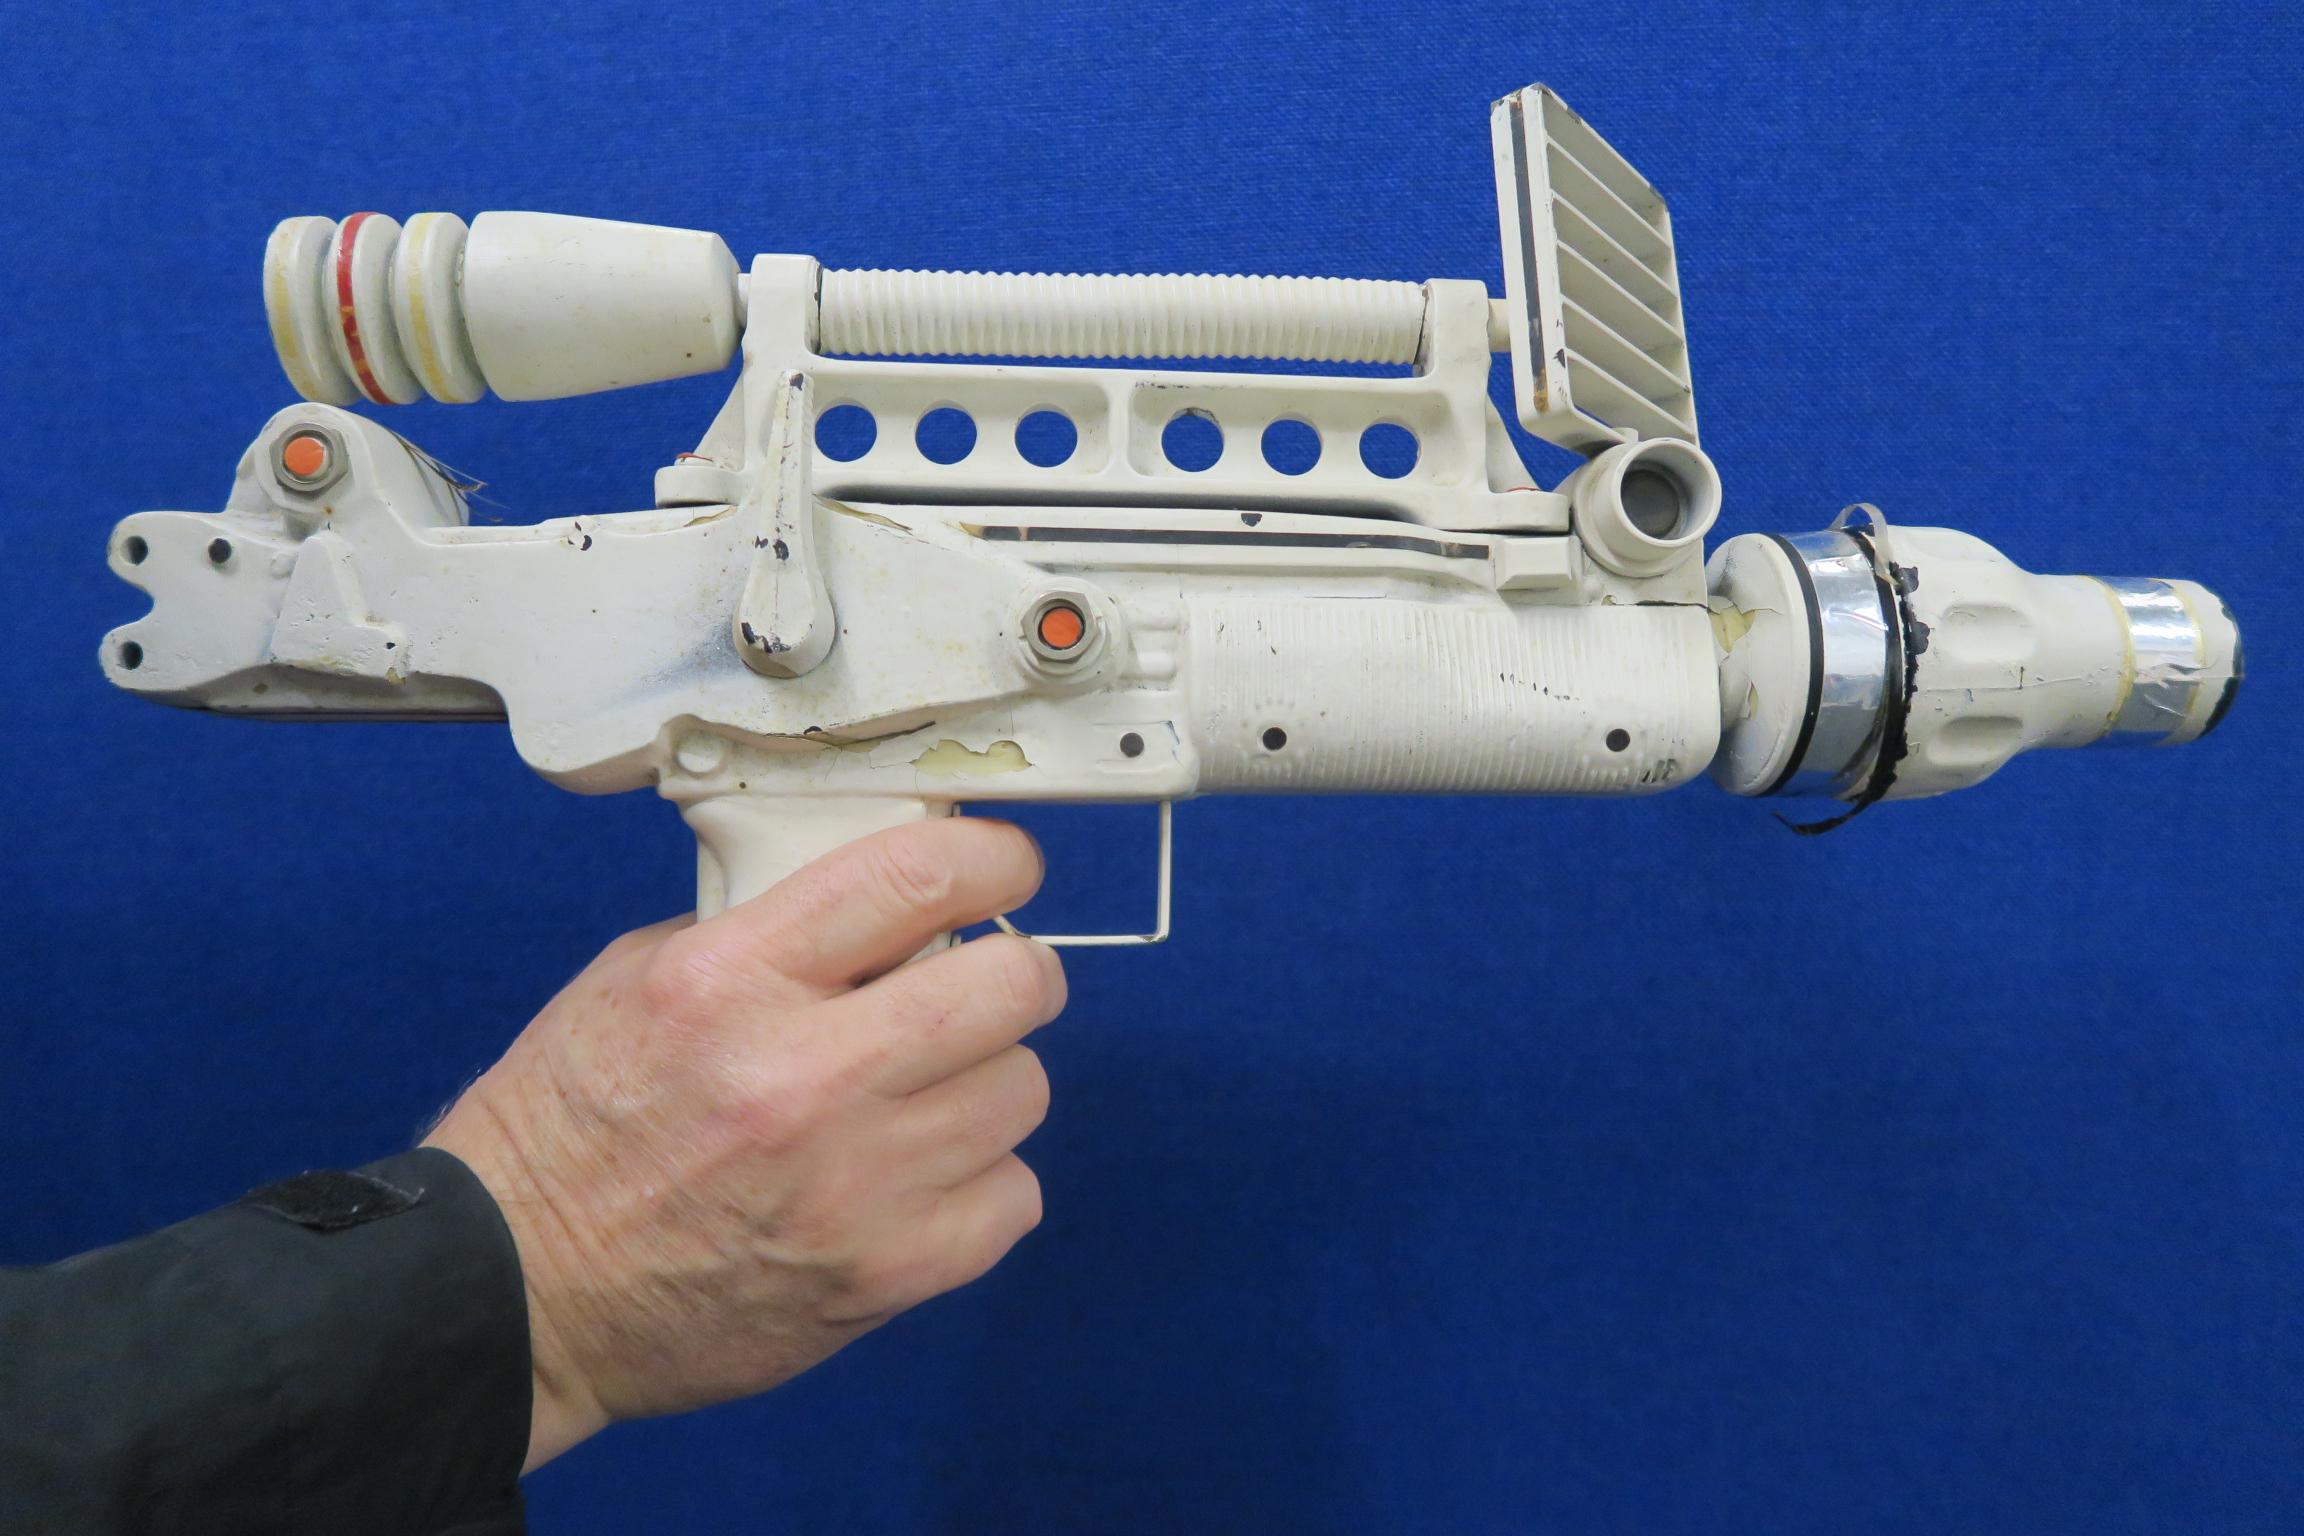 JAMES BOND 007 : Moonraker laser rifle created especially for this futuristic James Bond 1979 film. - Image 6 of 7